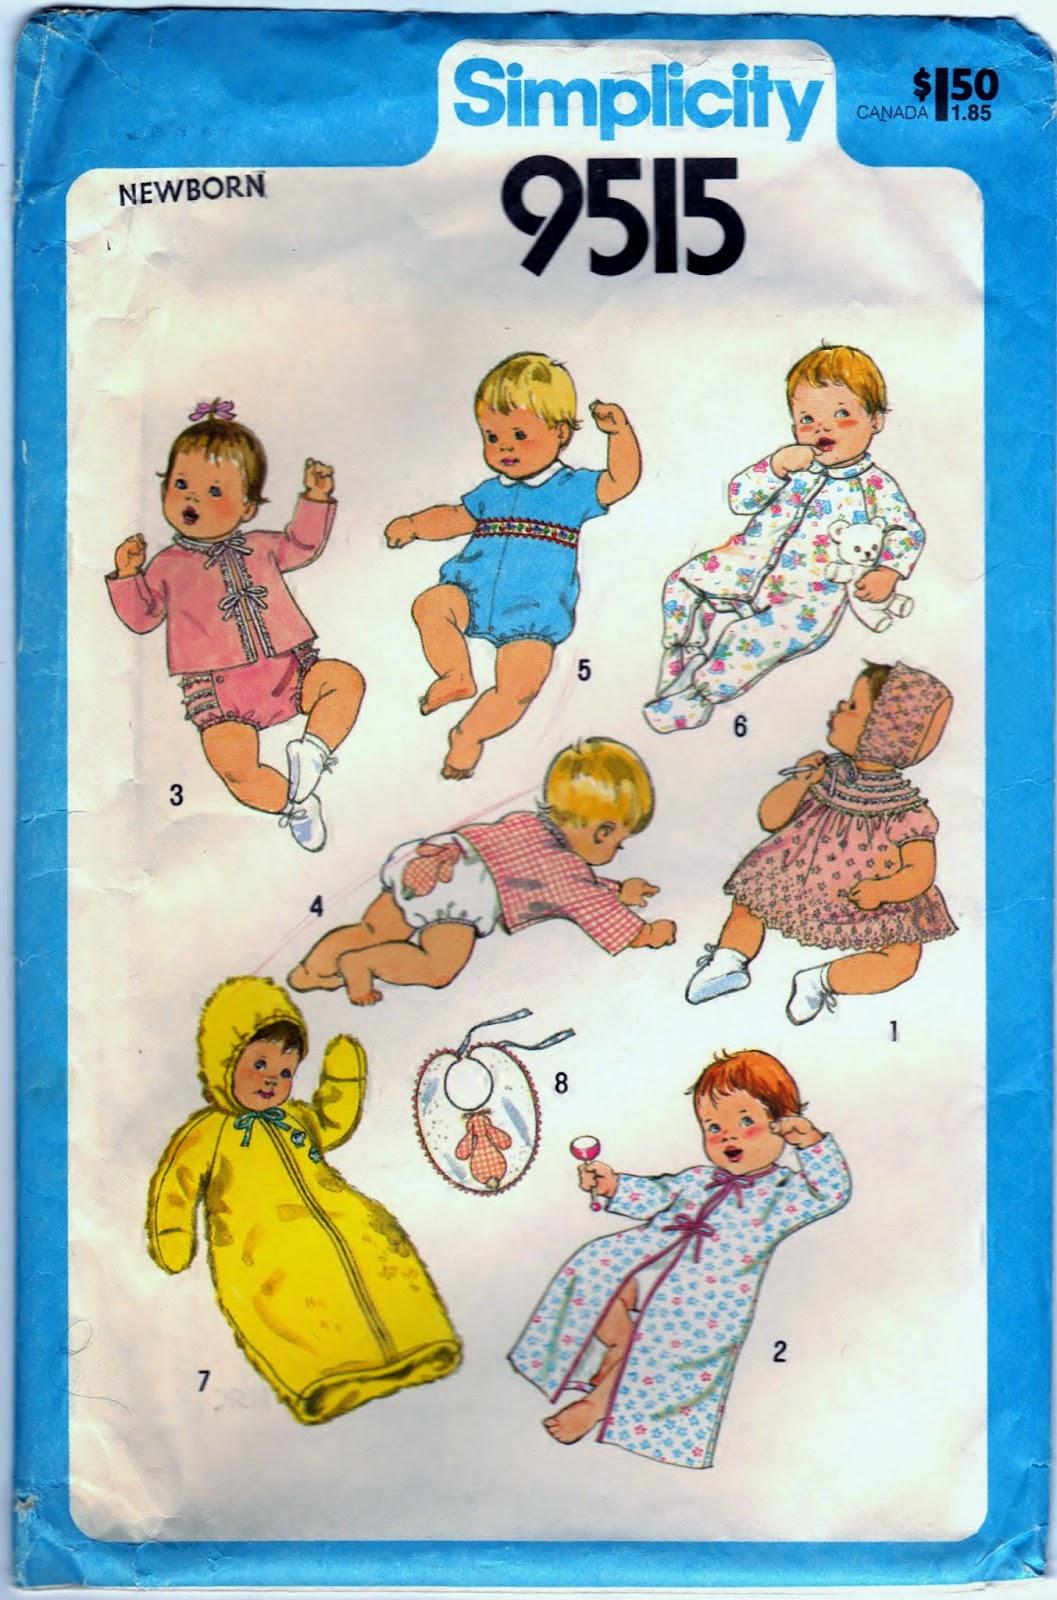 https://www.etsy.com/listing/223210526/simplicity-9515-pattern-babies-layette